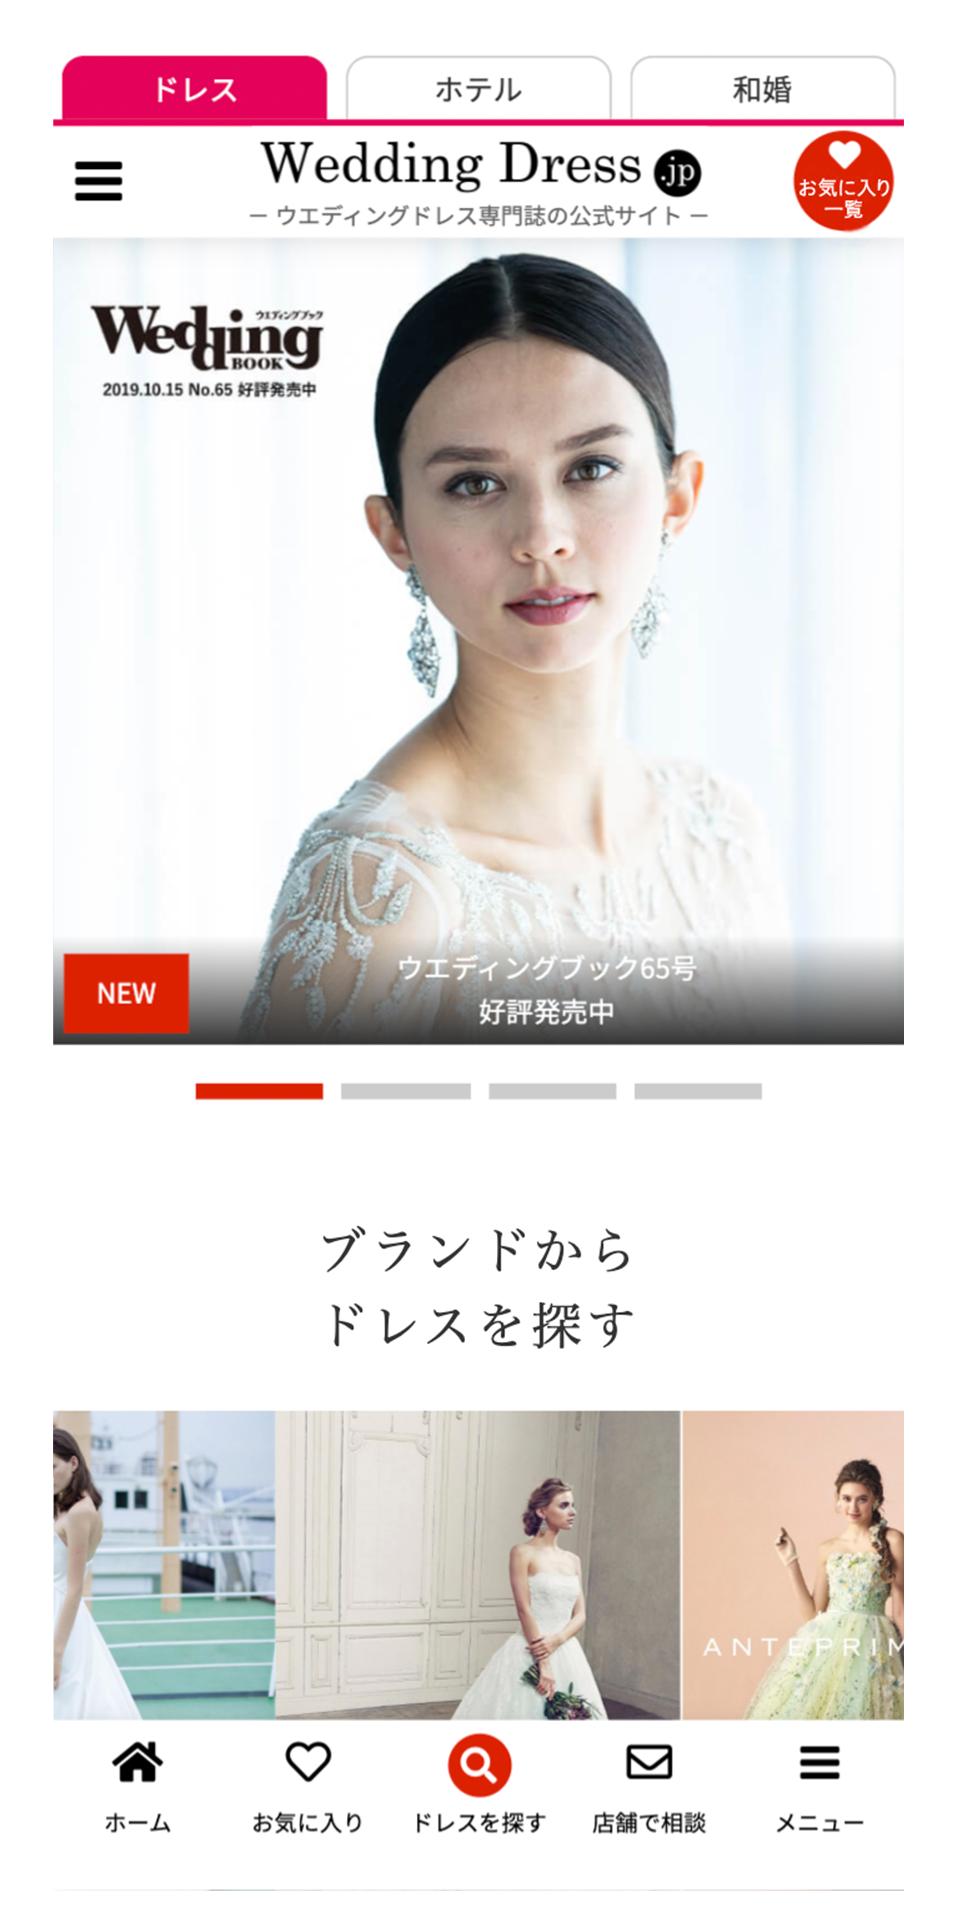 Wedding Dress.jp